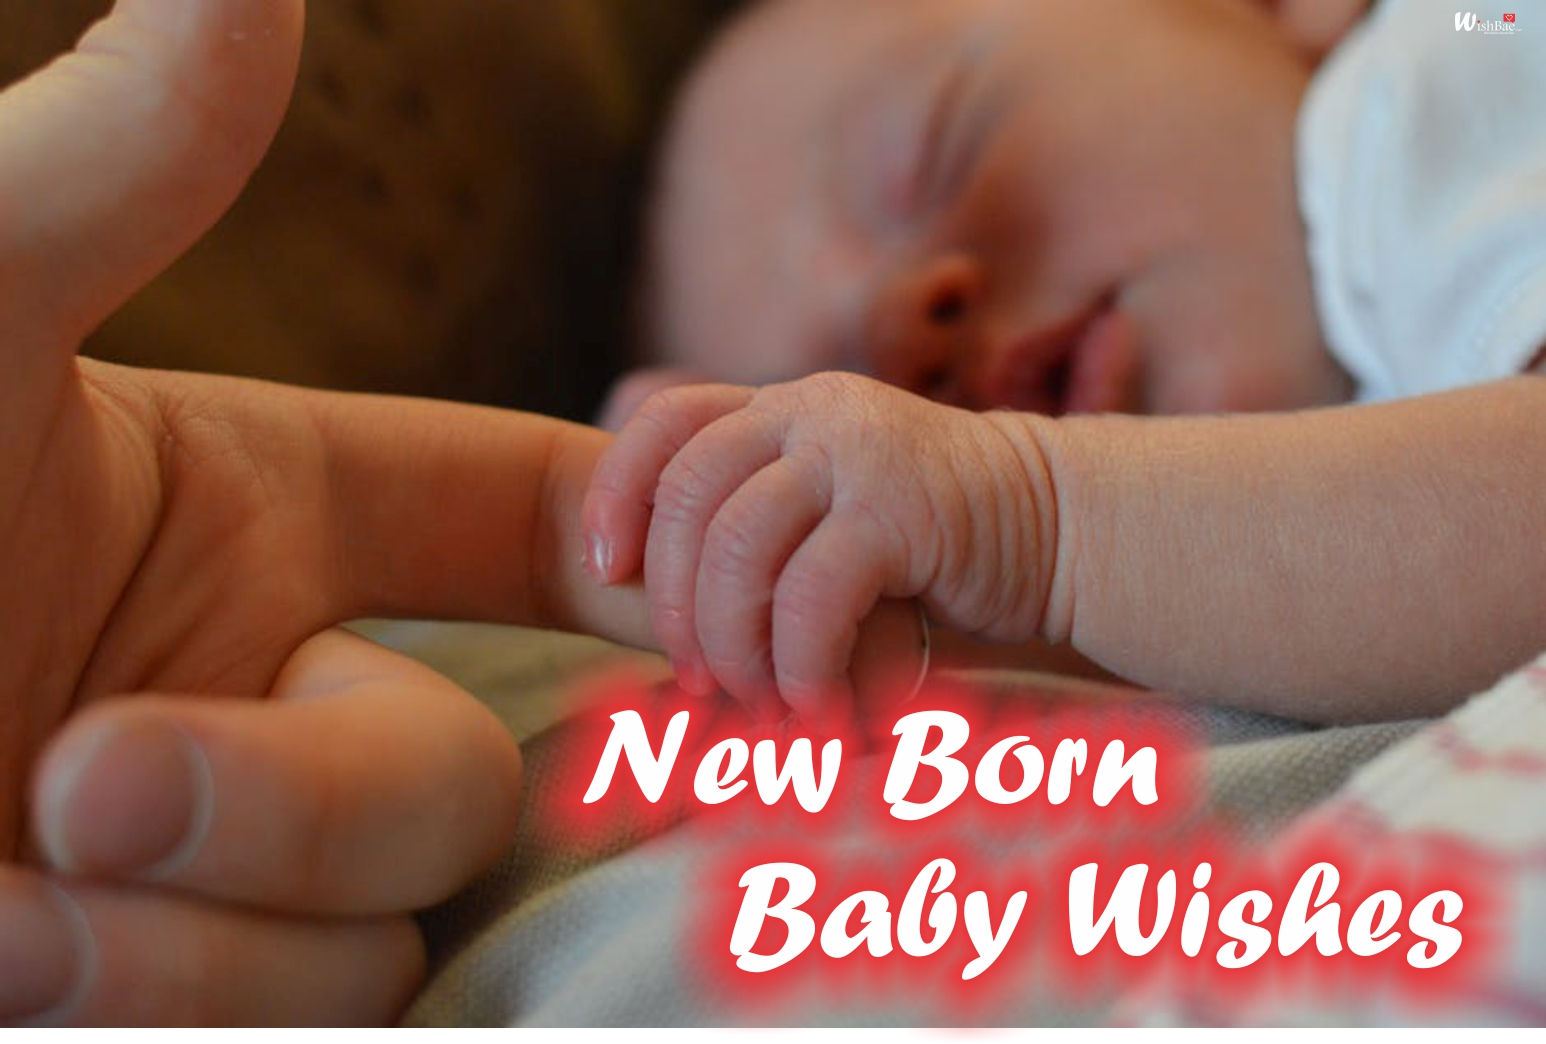 Impressive New Born Baby Wishes Latest Collection Baby Shower Wishes New Baby Wishes Coworker New Baby Wishes Pa baby shower New Baby Wishes